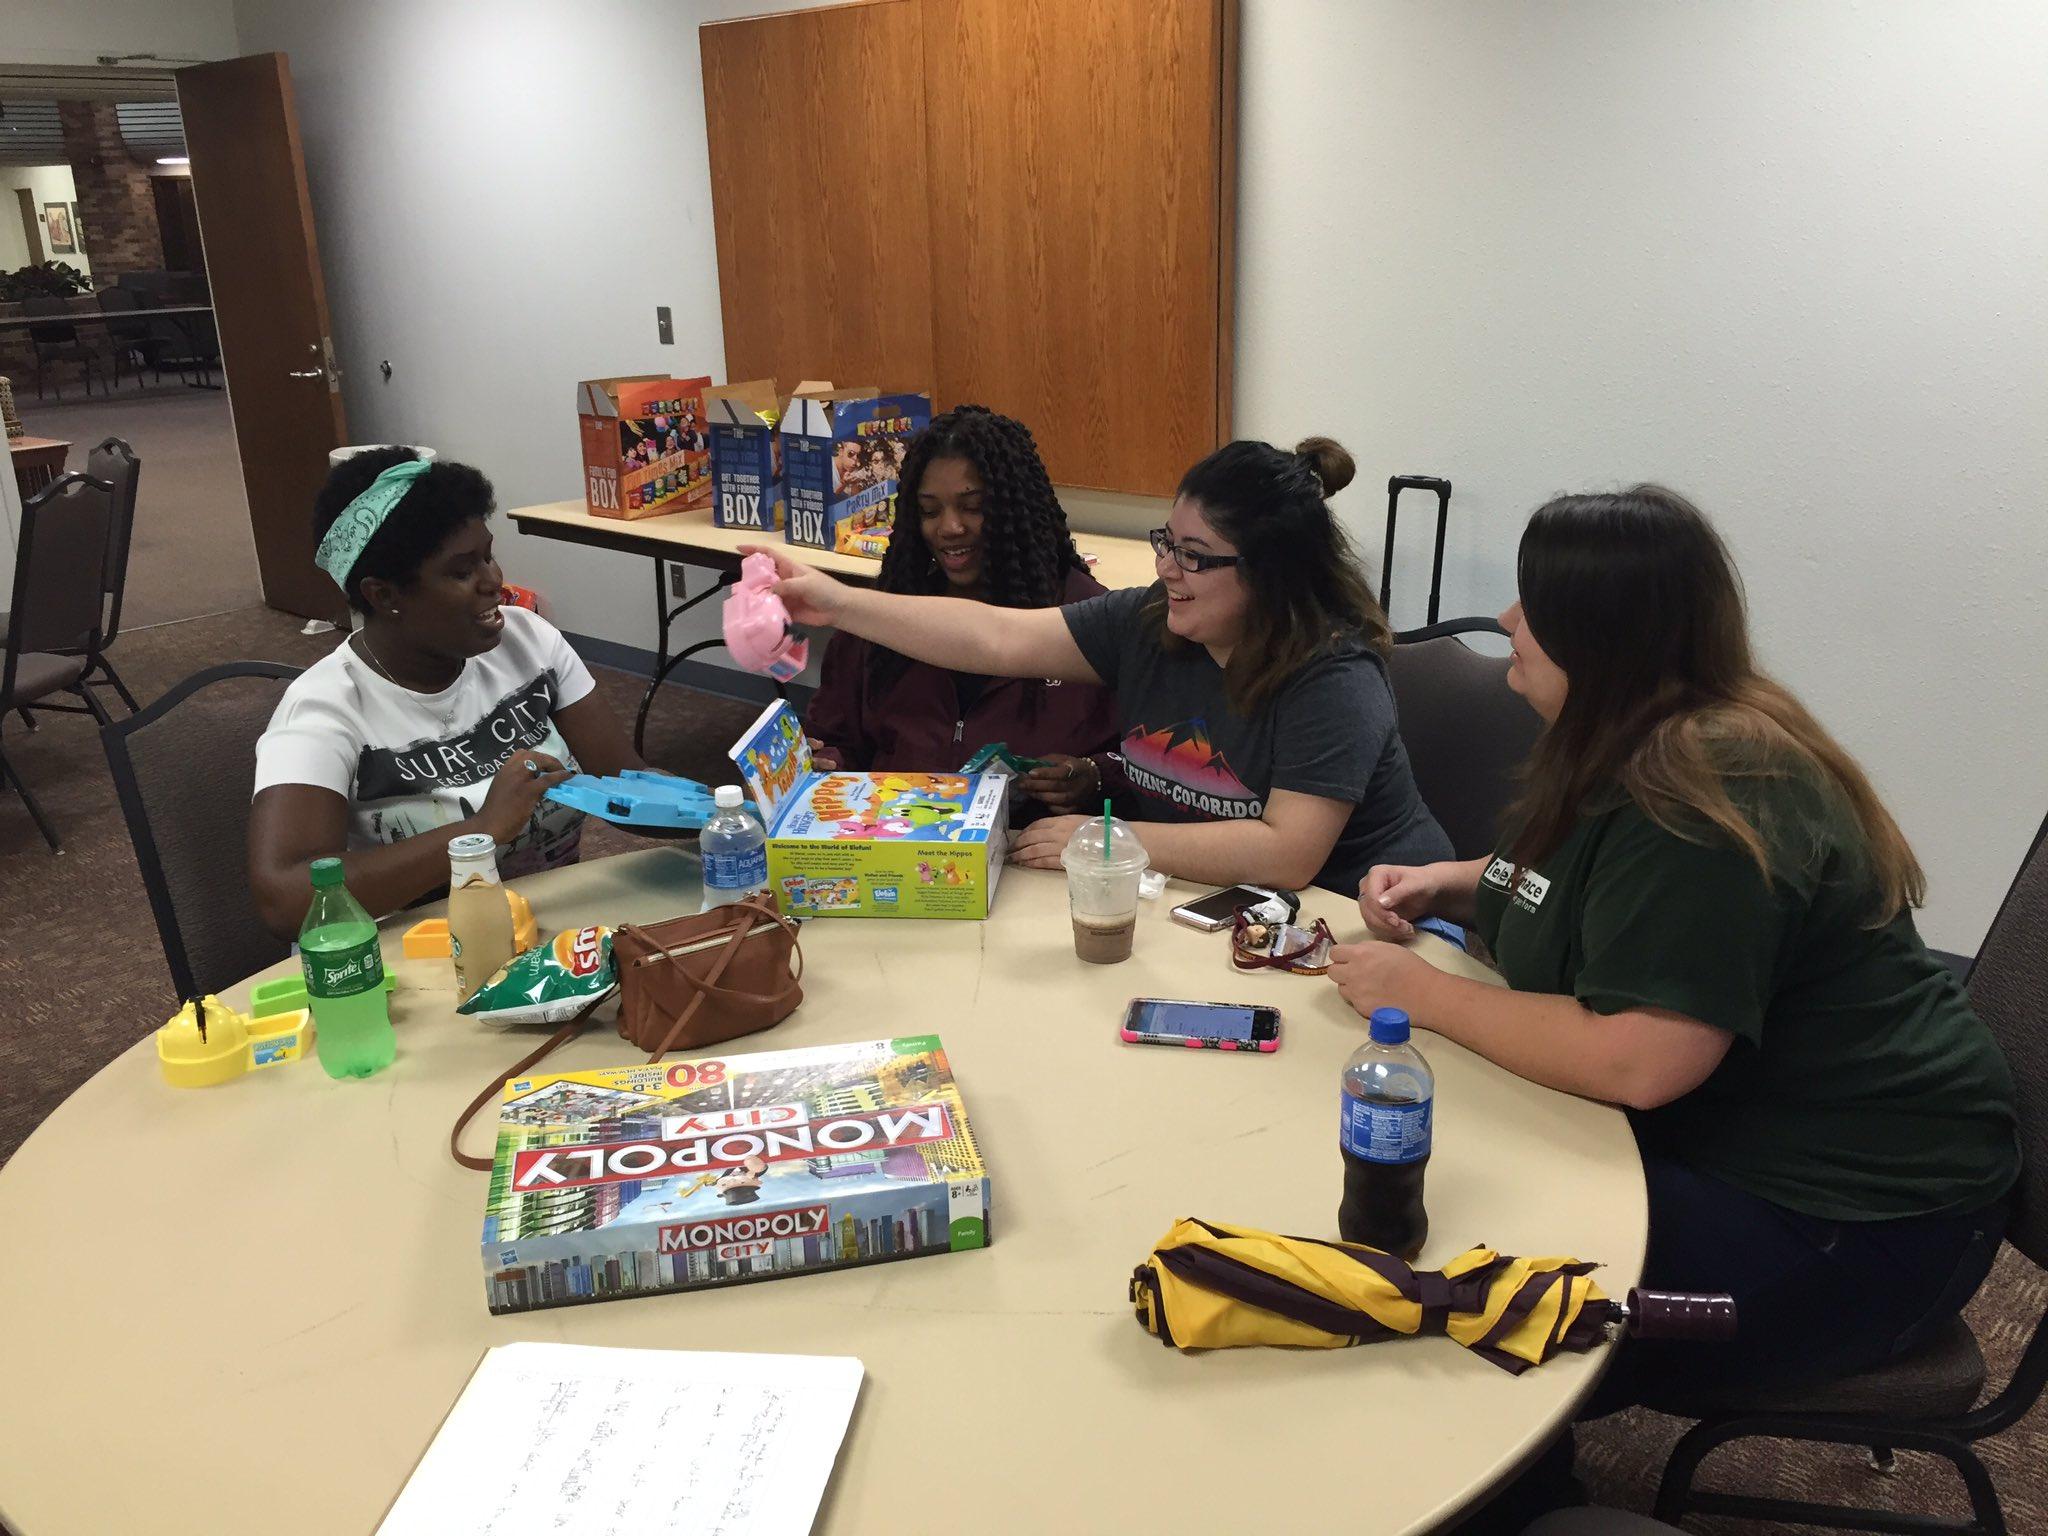 Students 'destress' at UPB Game Night